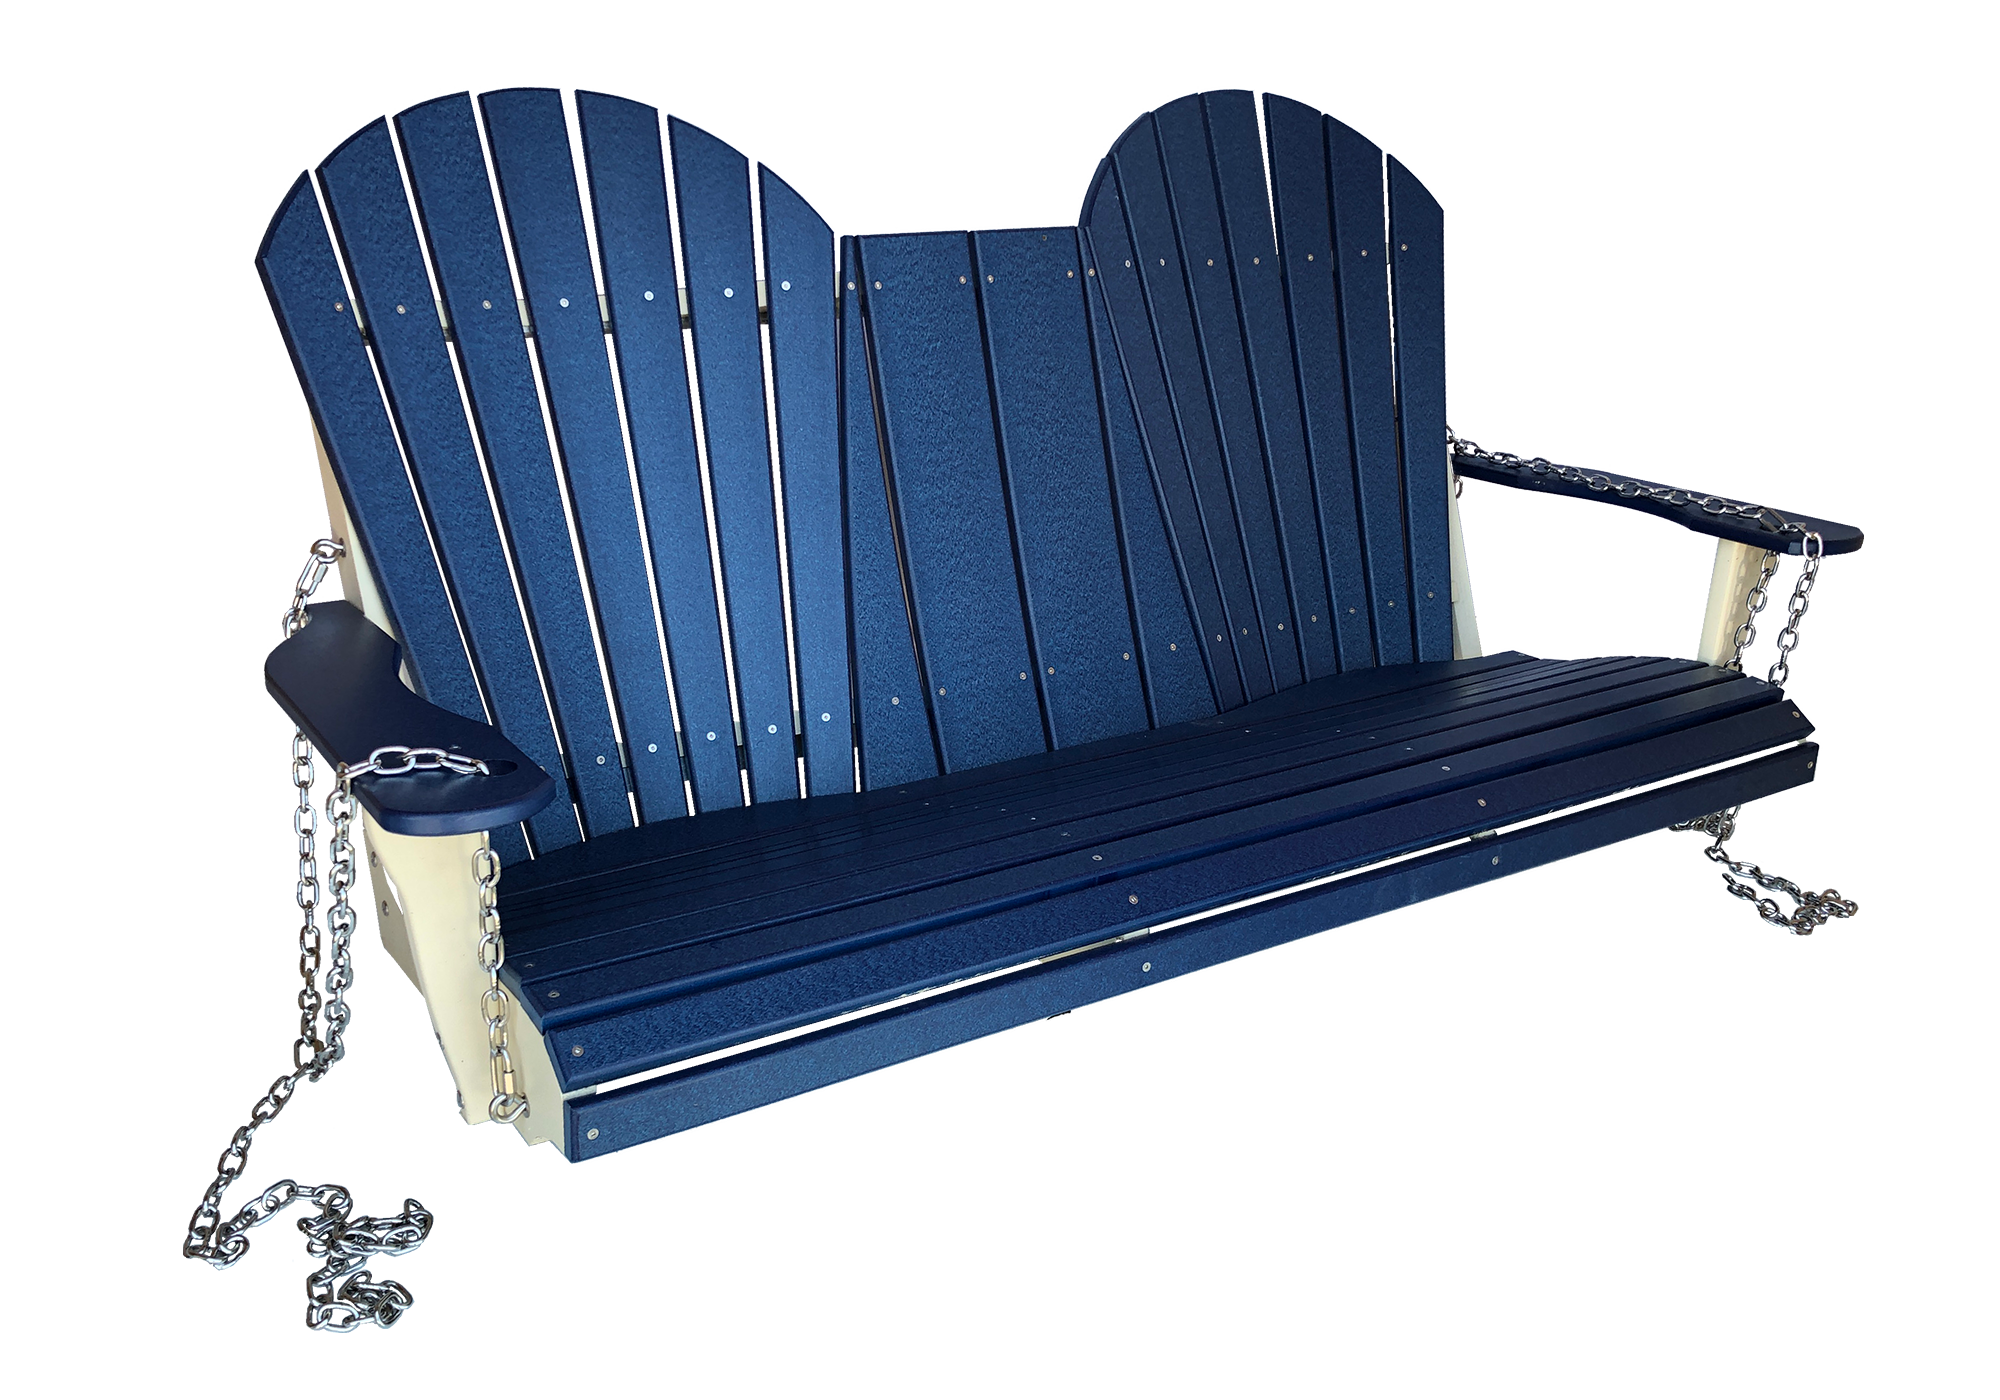 14 fanback porch swing outdoor porch furniture